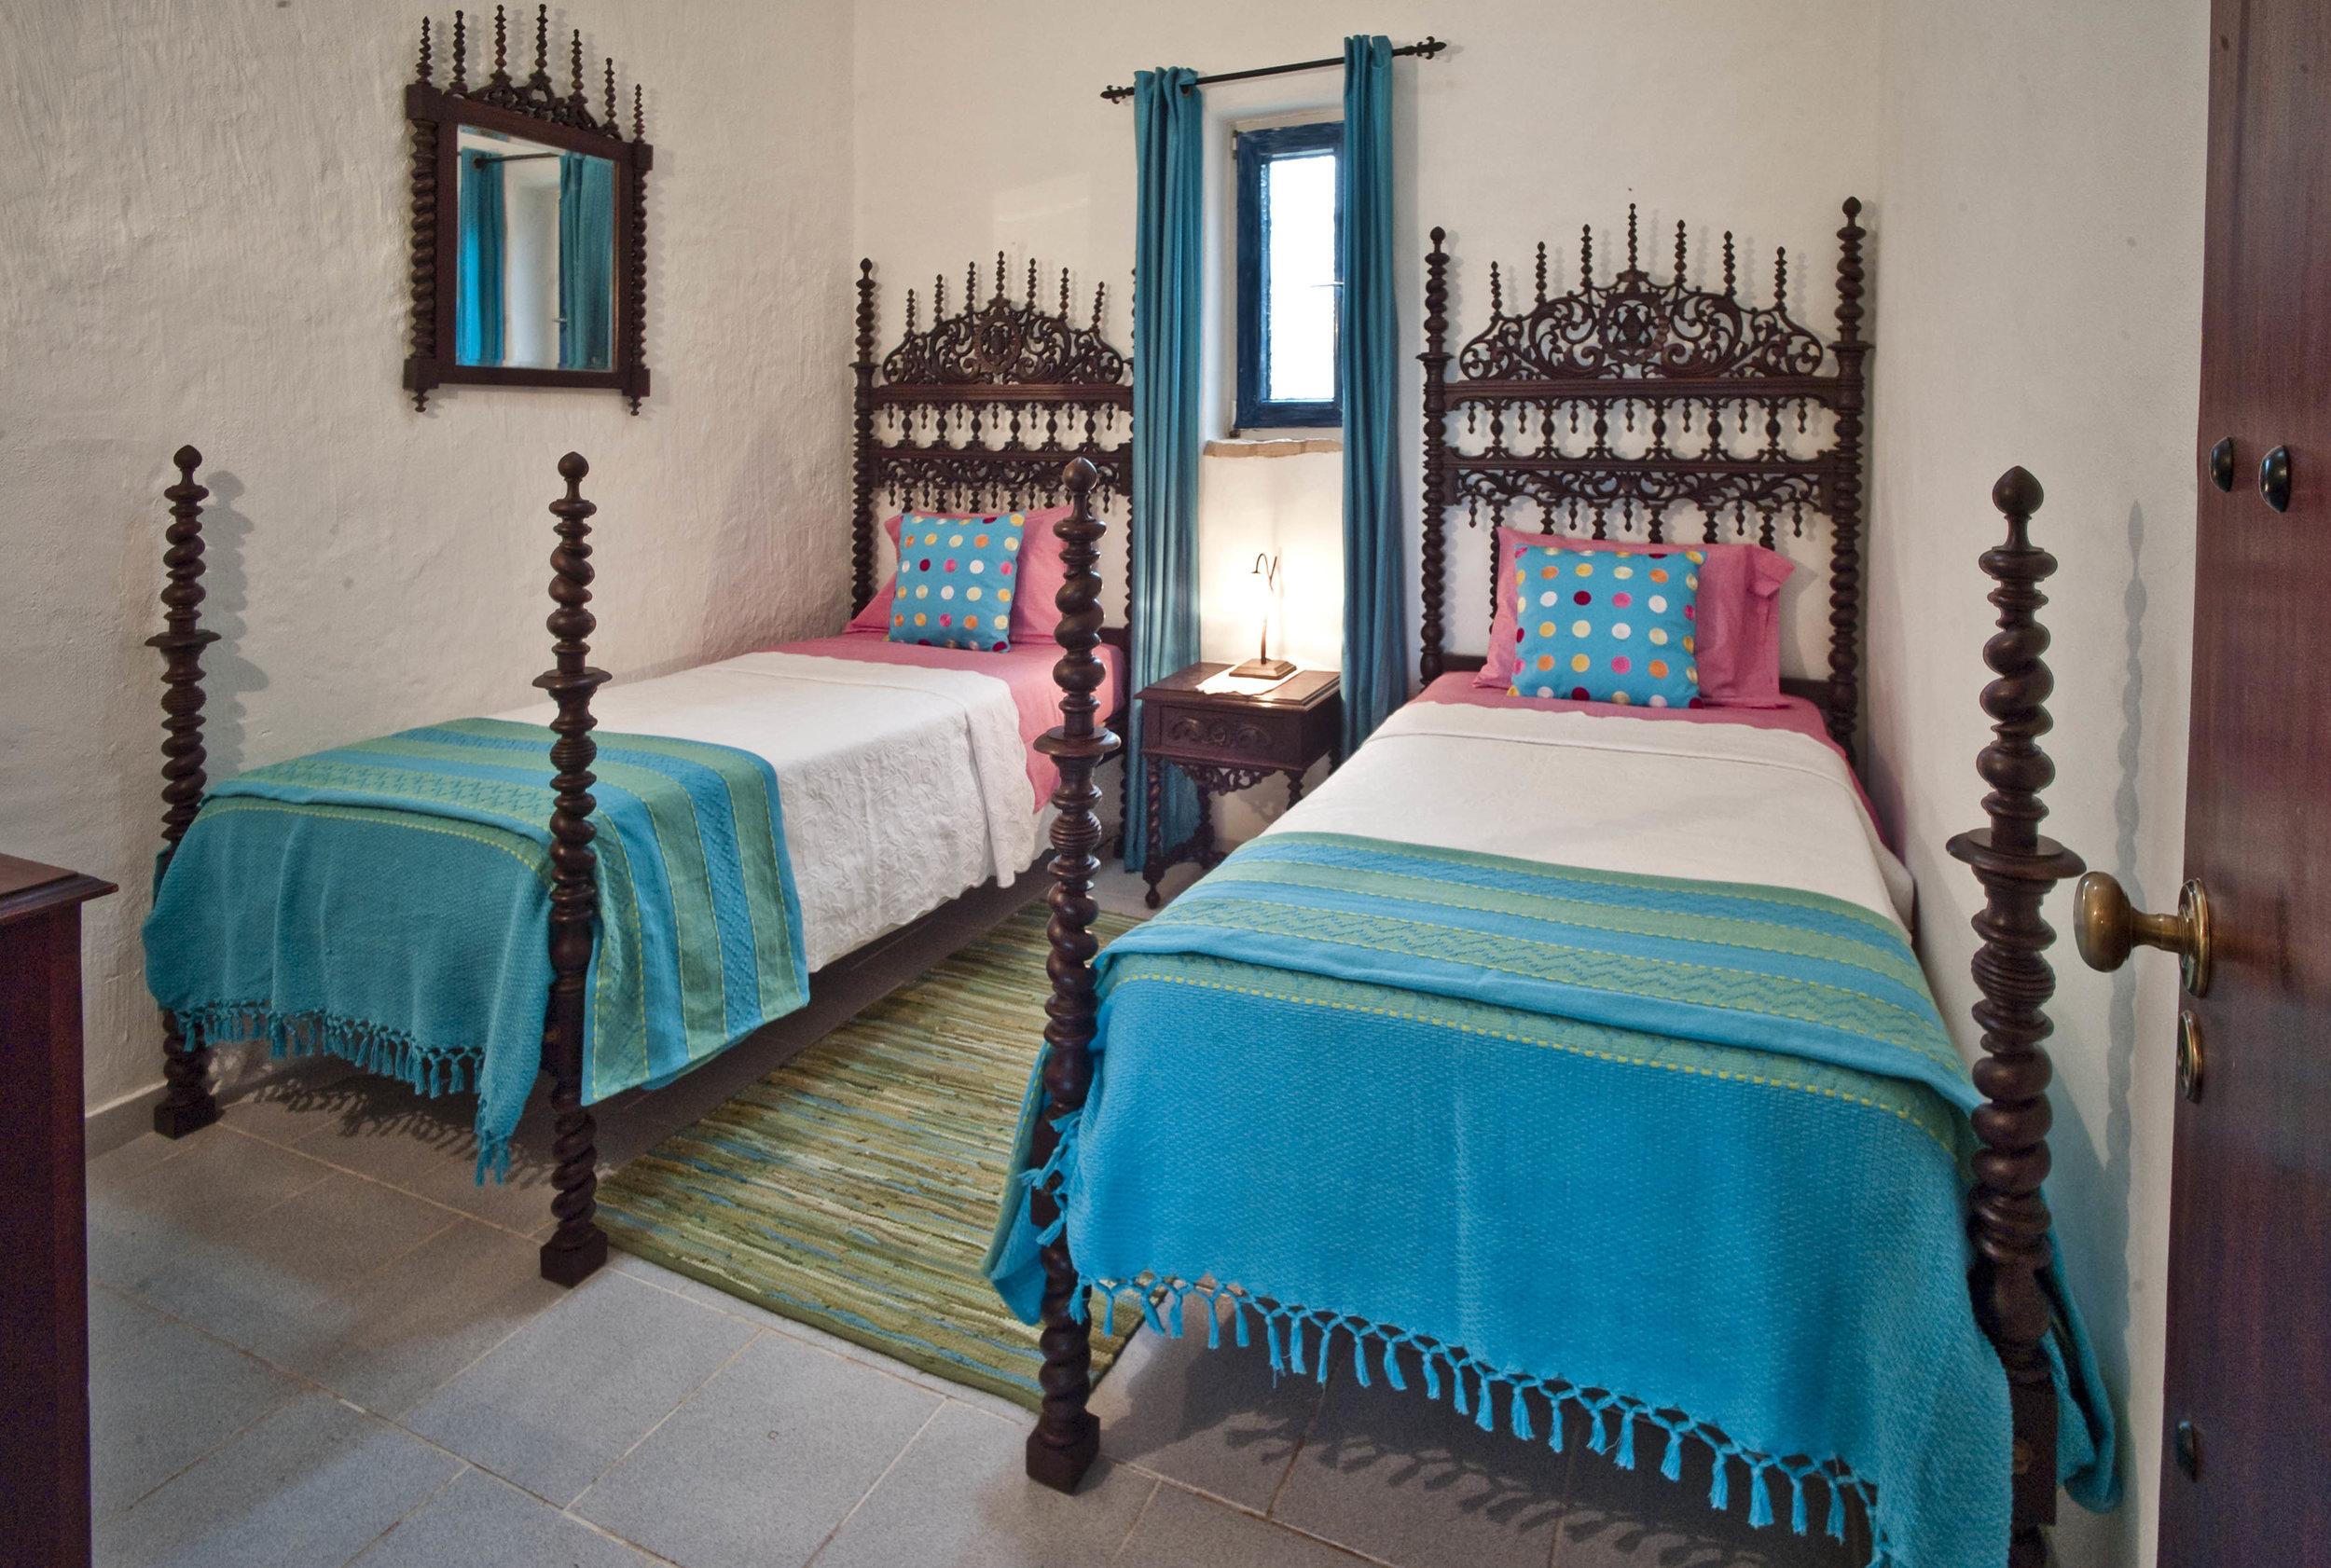 14_Apartment Bedroom 2.jpg